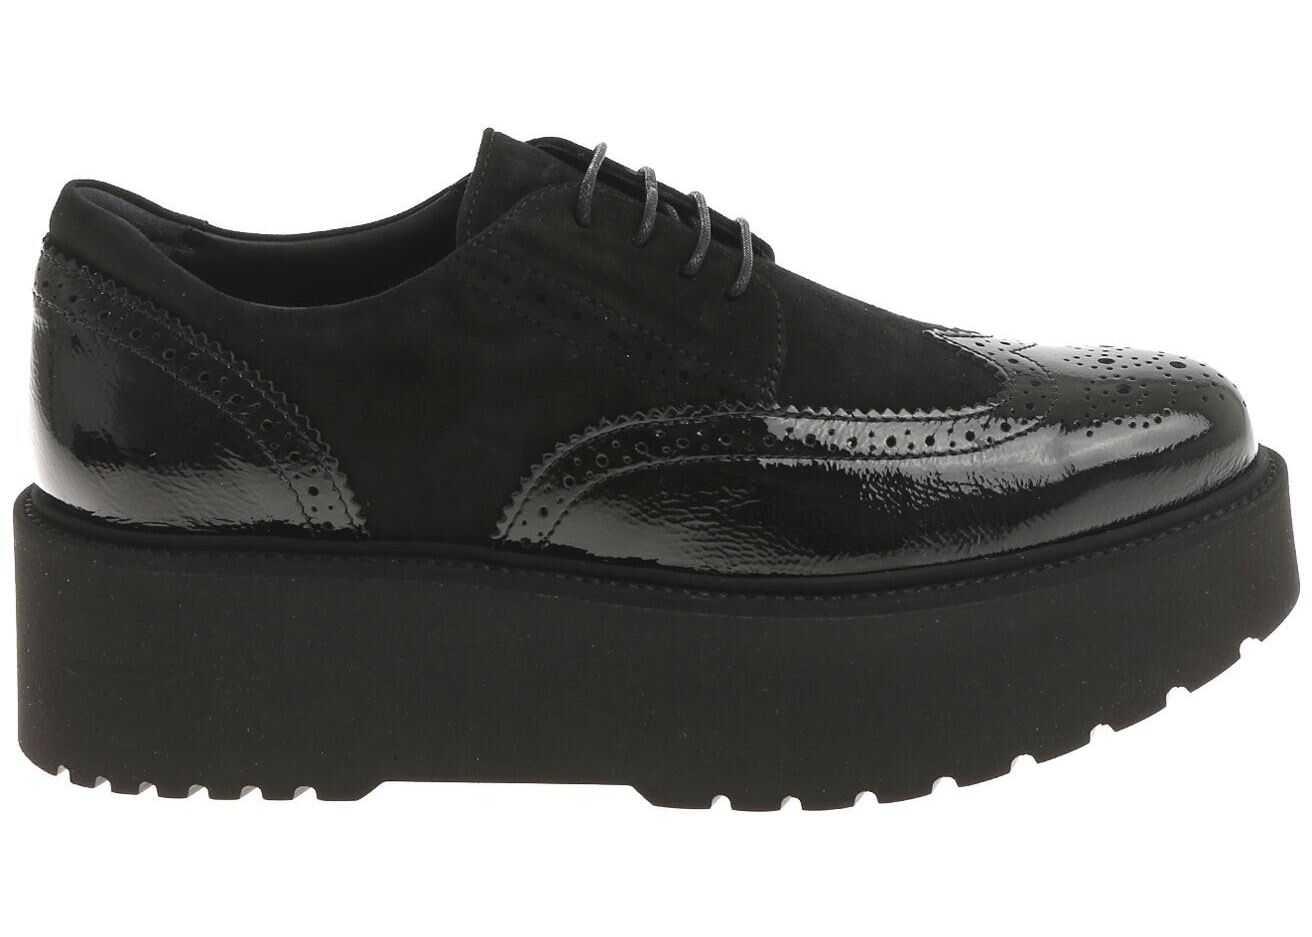 Hogan Black Derby Brogue H355 Shoes Black